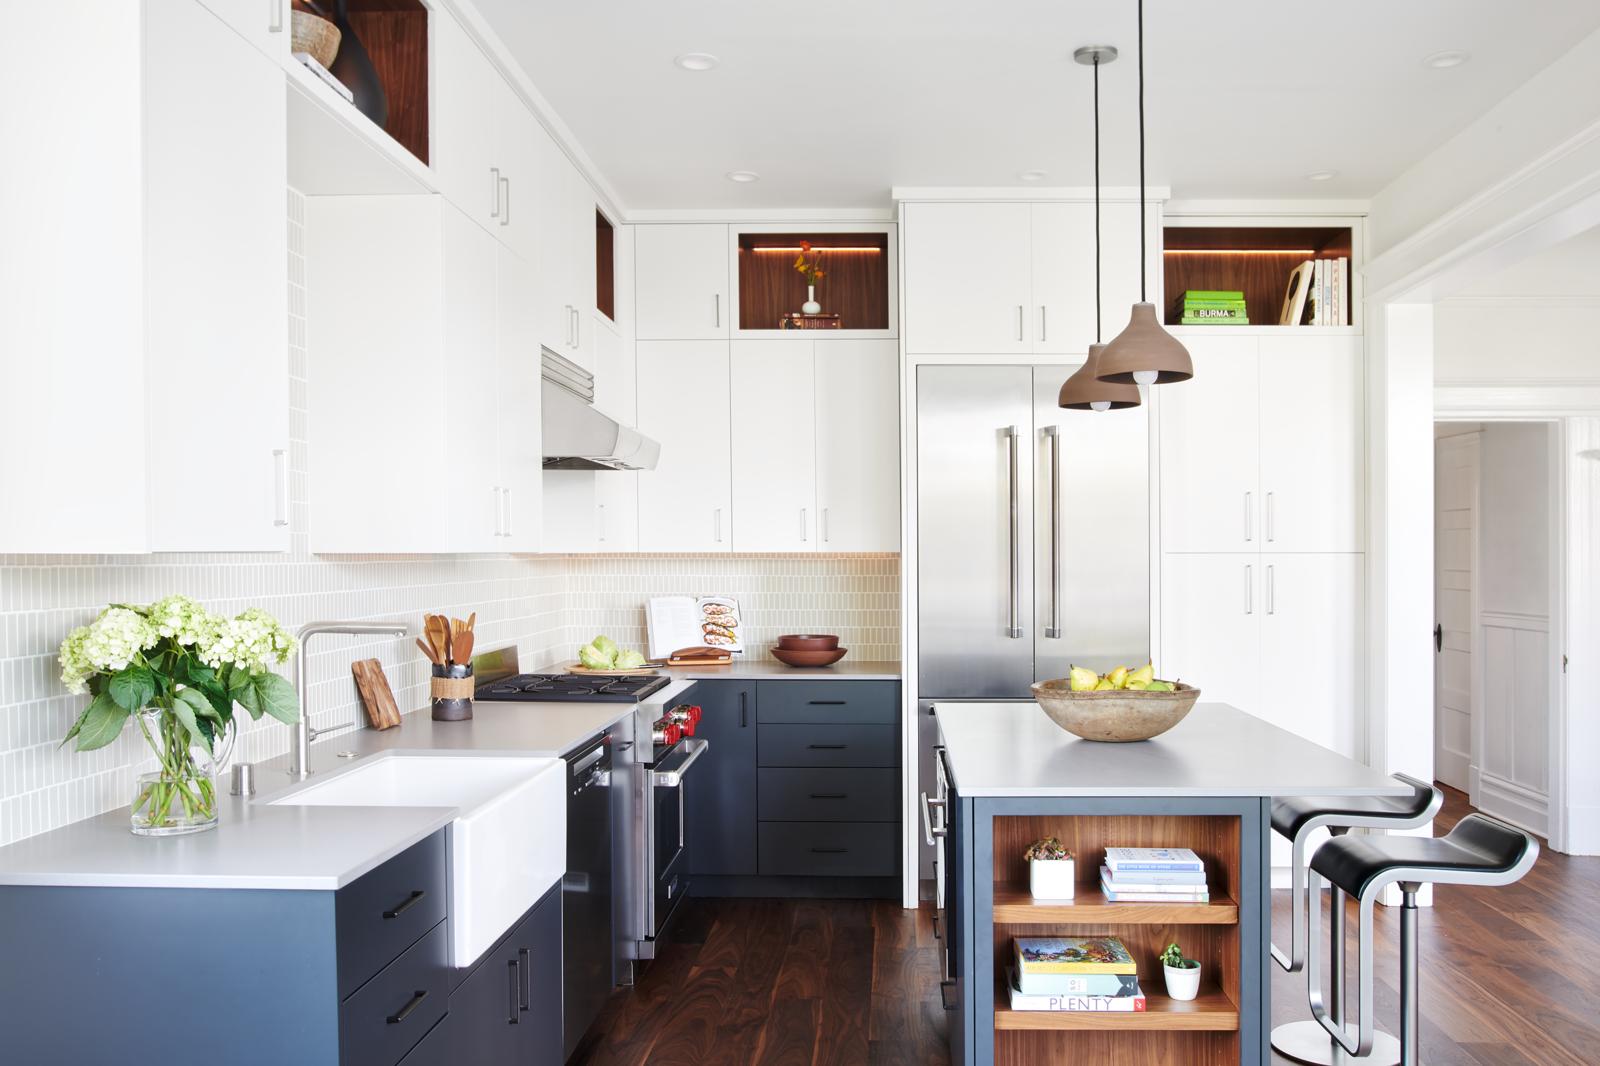 Treat Avenue Kitchen Modern Home in San Francisco, California on Dwell